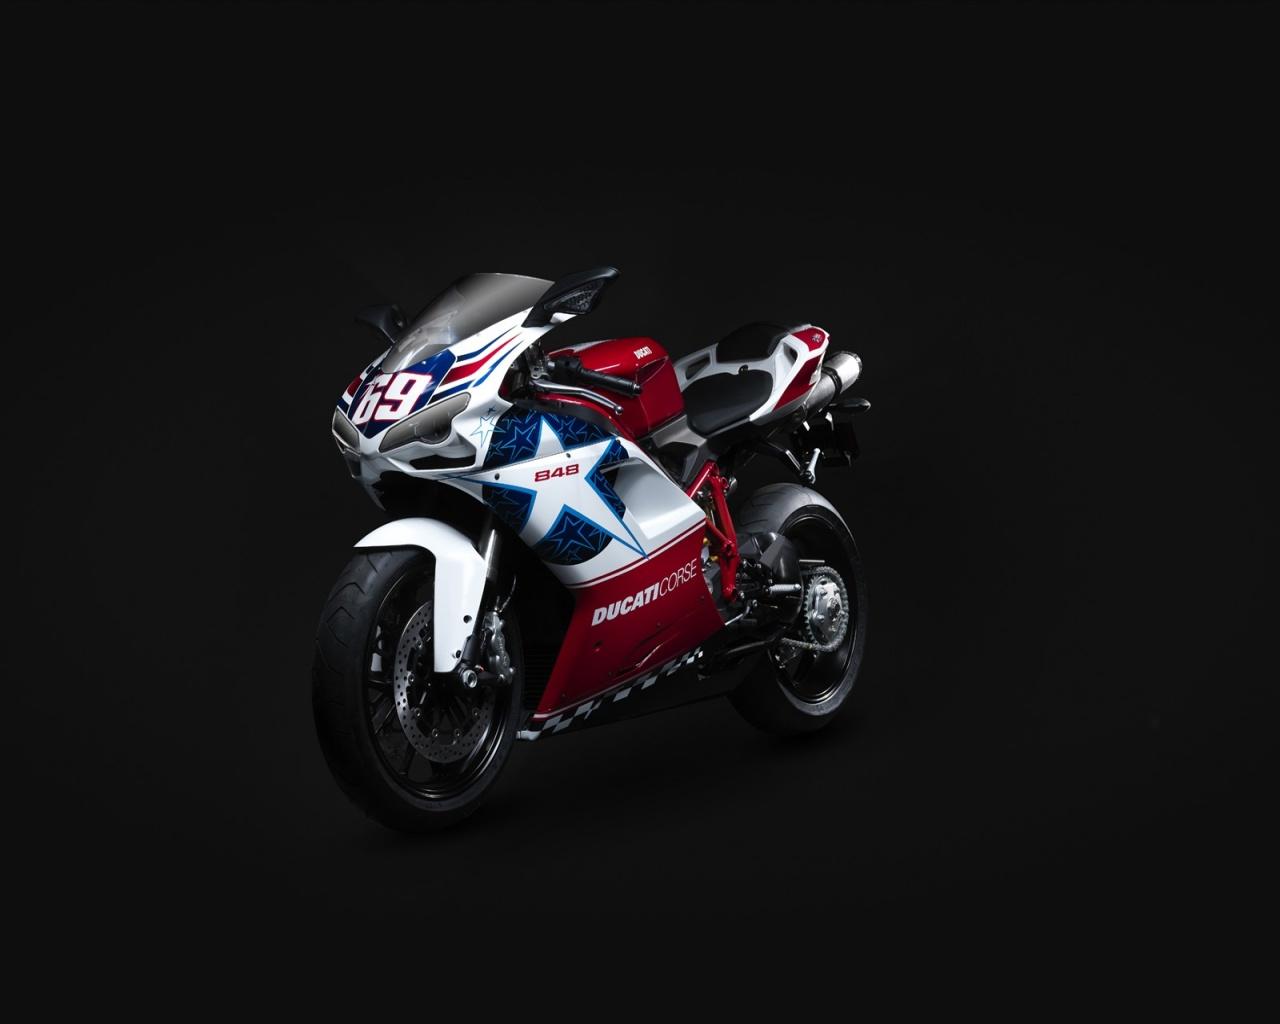 Ducati 848 Bike Wallpapers HD Wallpapers 1280x1024